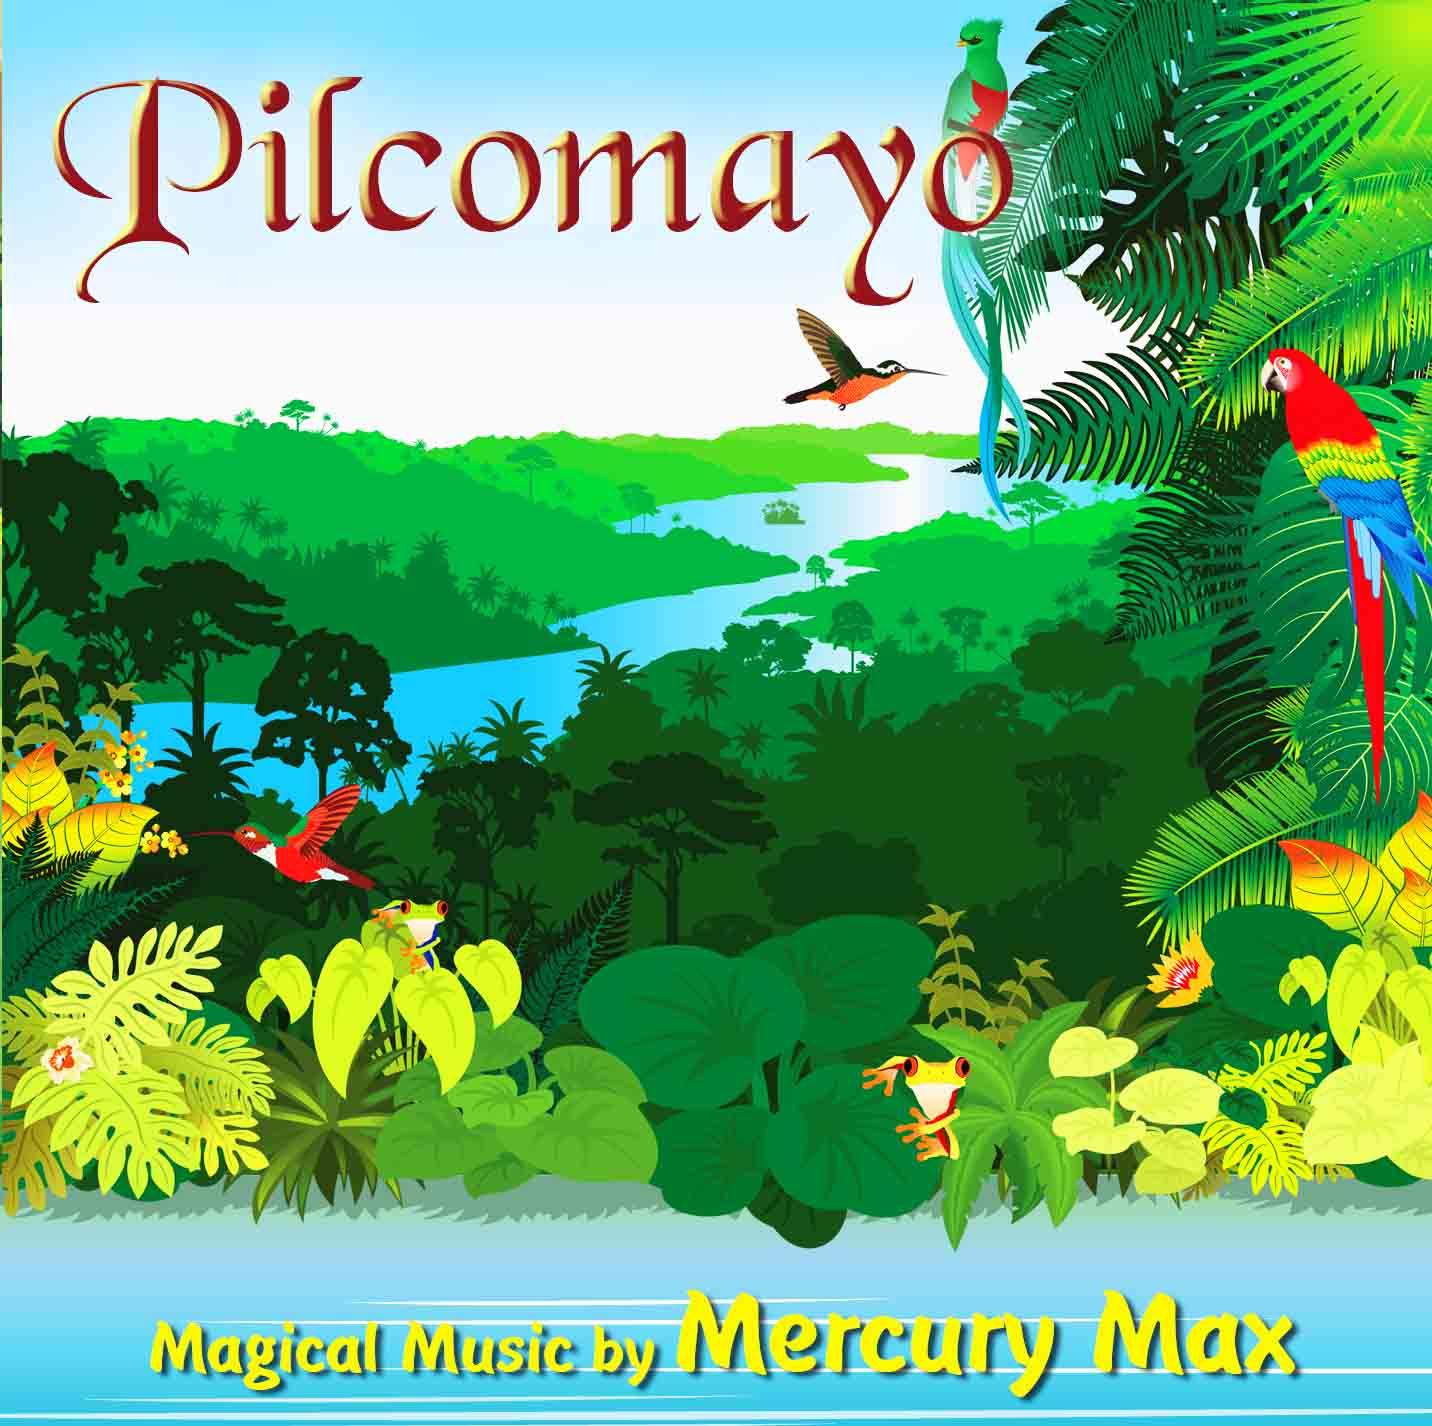 Pilcomayo CD by Mercury Max